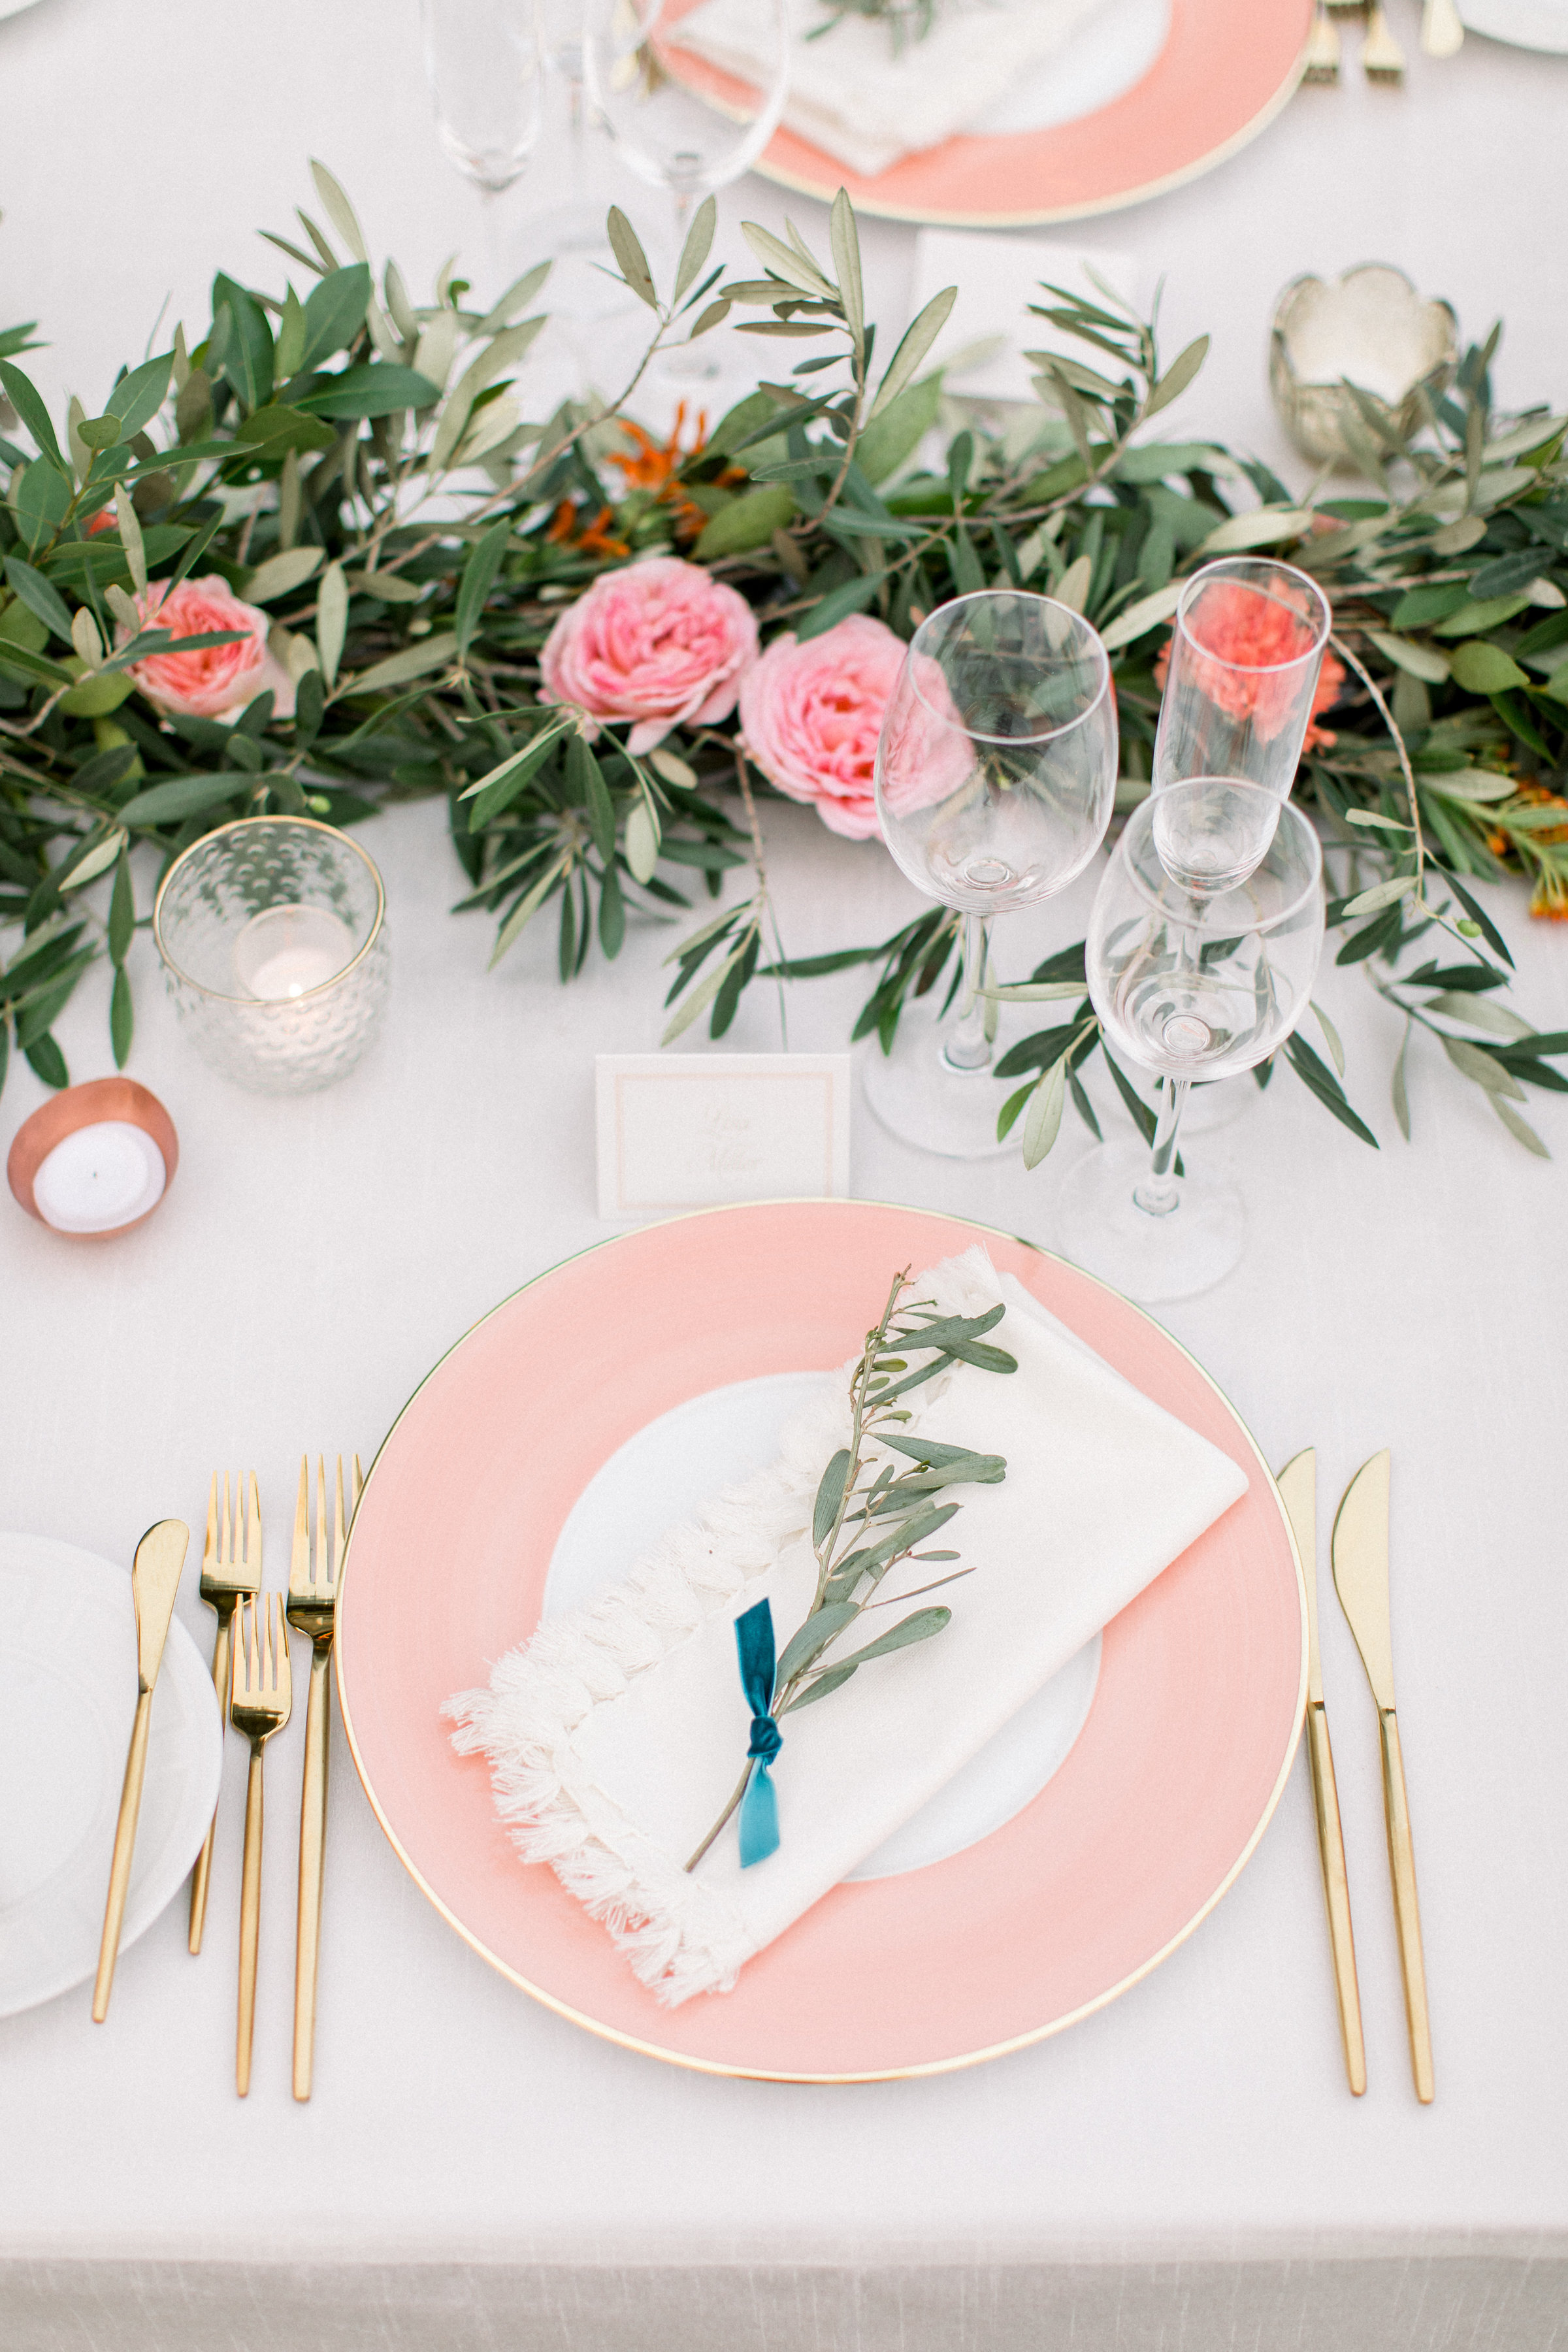 garland centerpiece with pink garden roses